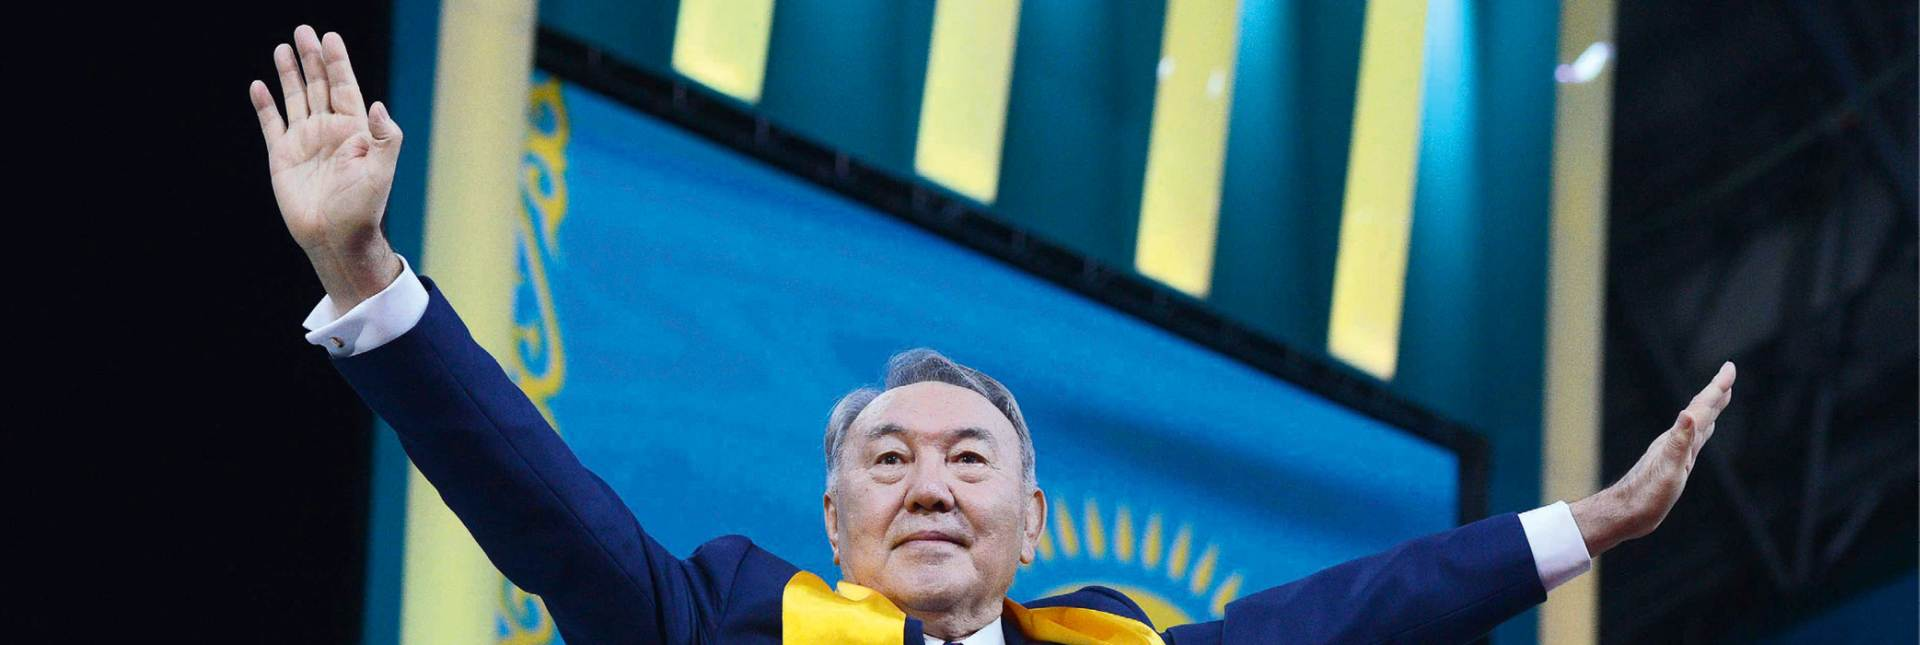 FC Astana u Ligi prvaka po želji kazahstanskog apsolutista Nursultana Nazarbajeva